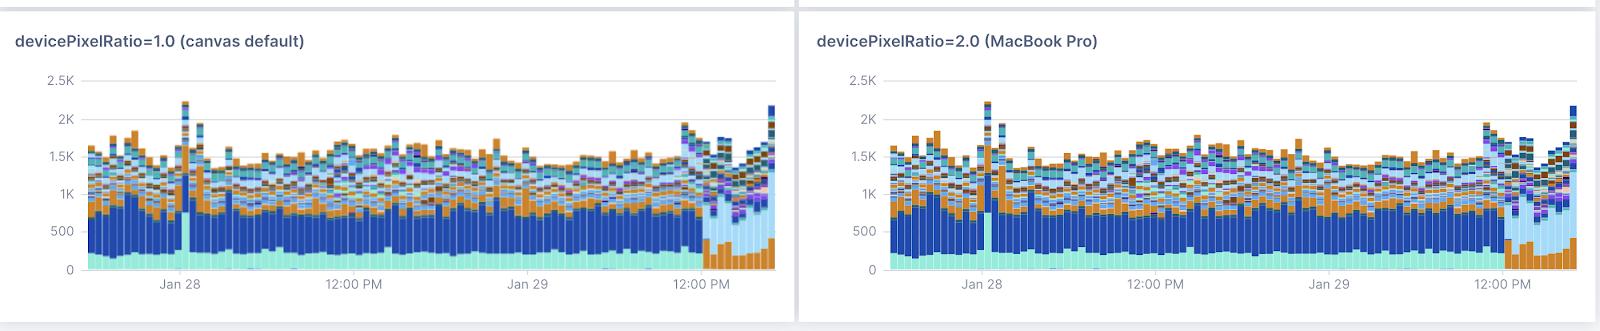 Lightstep Metrics Charting - devicePixelRatio 2